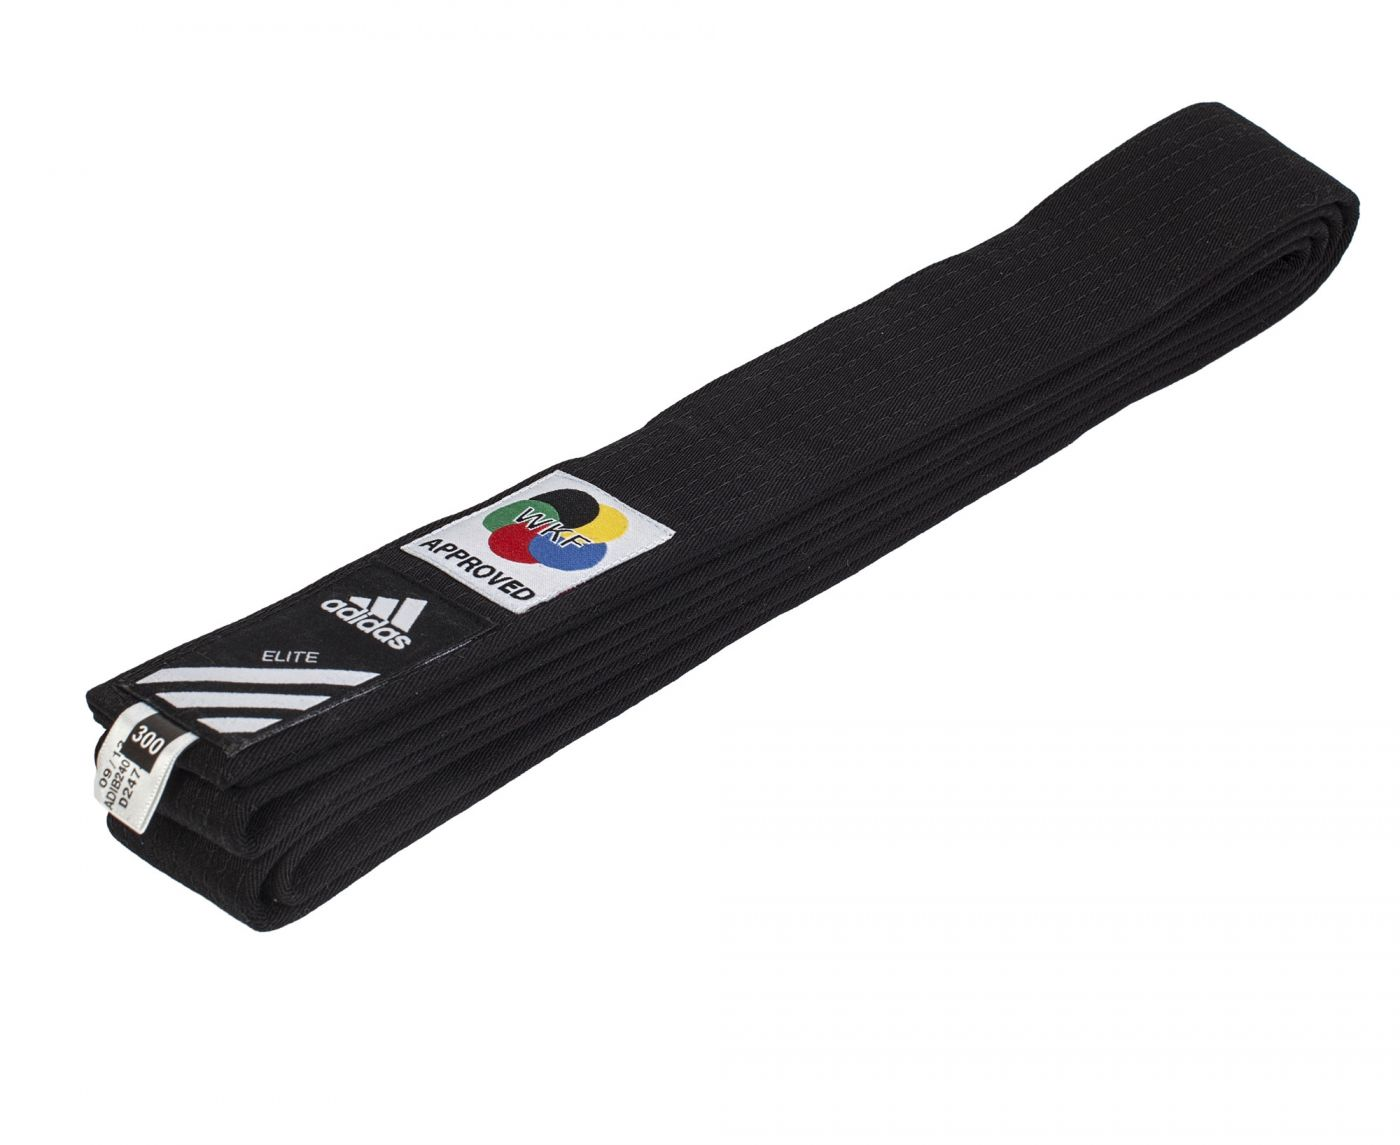 Пояс каратэ Adidas Elite WKF чёрный, длина 280 см, артикул adiB242K